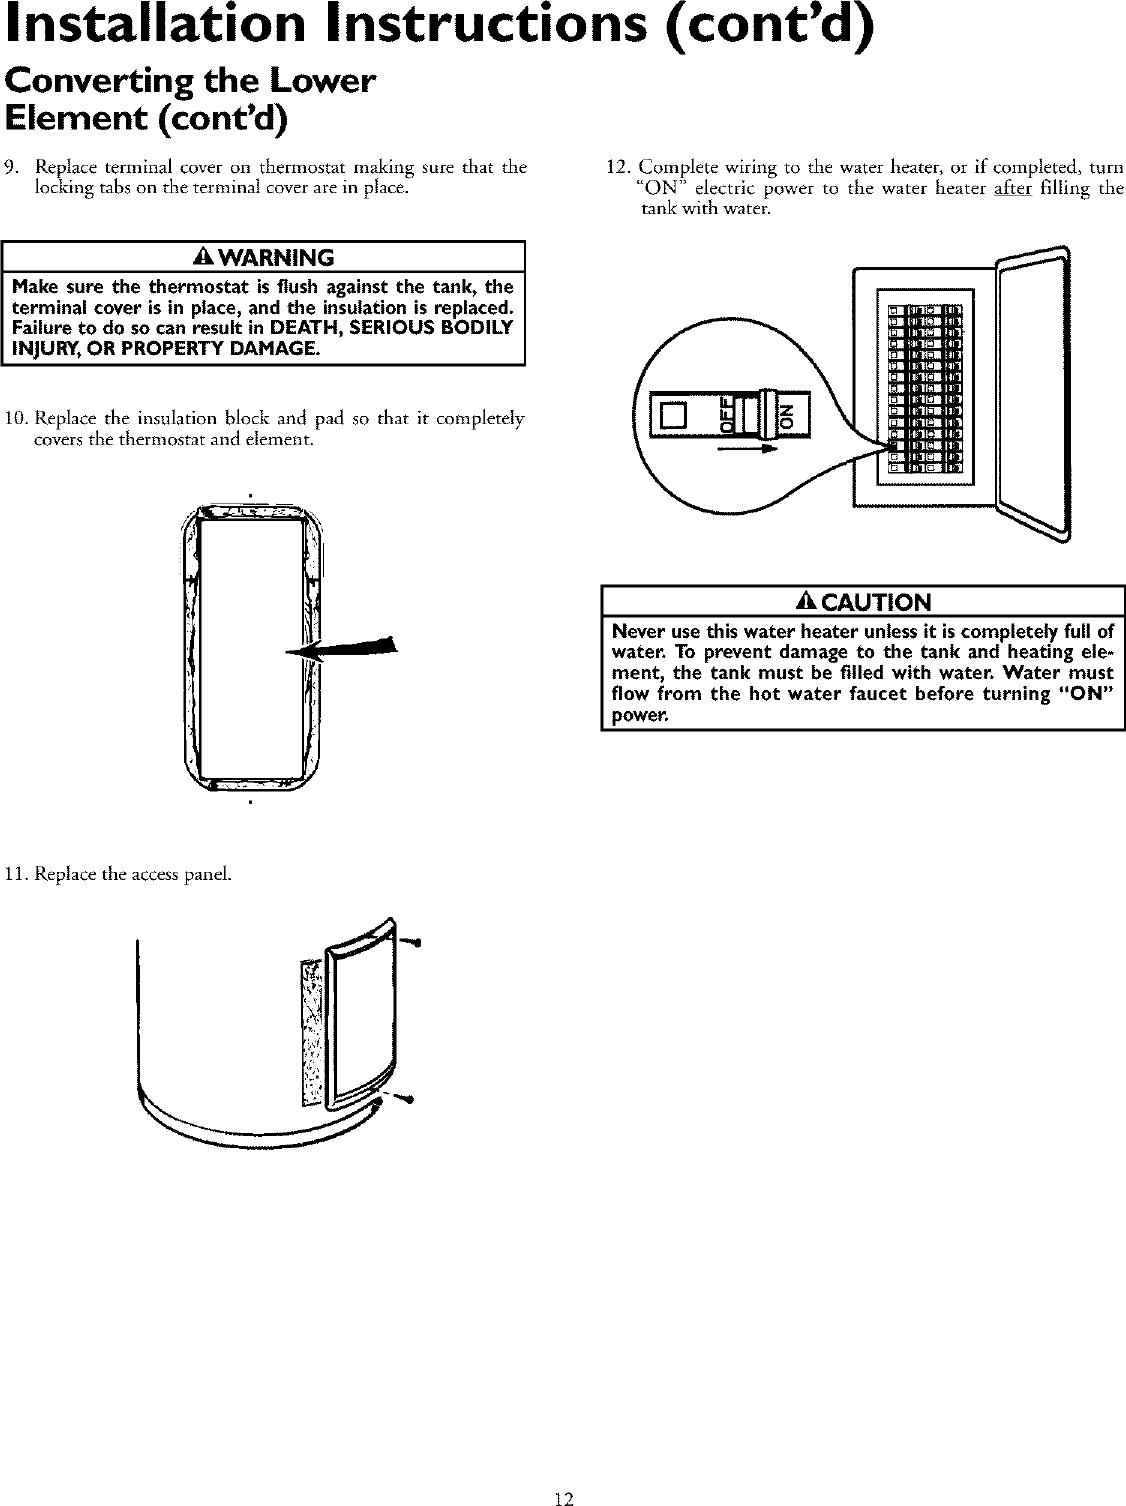 Heater Thermostat Wiring Besides Hot Water Tank Heater Wiring Diagram